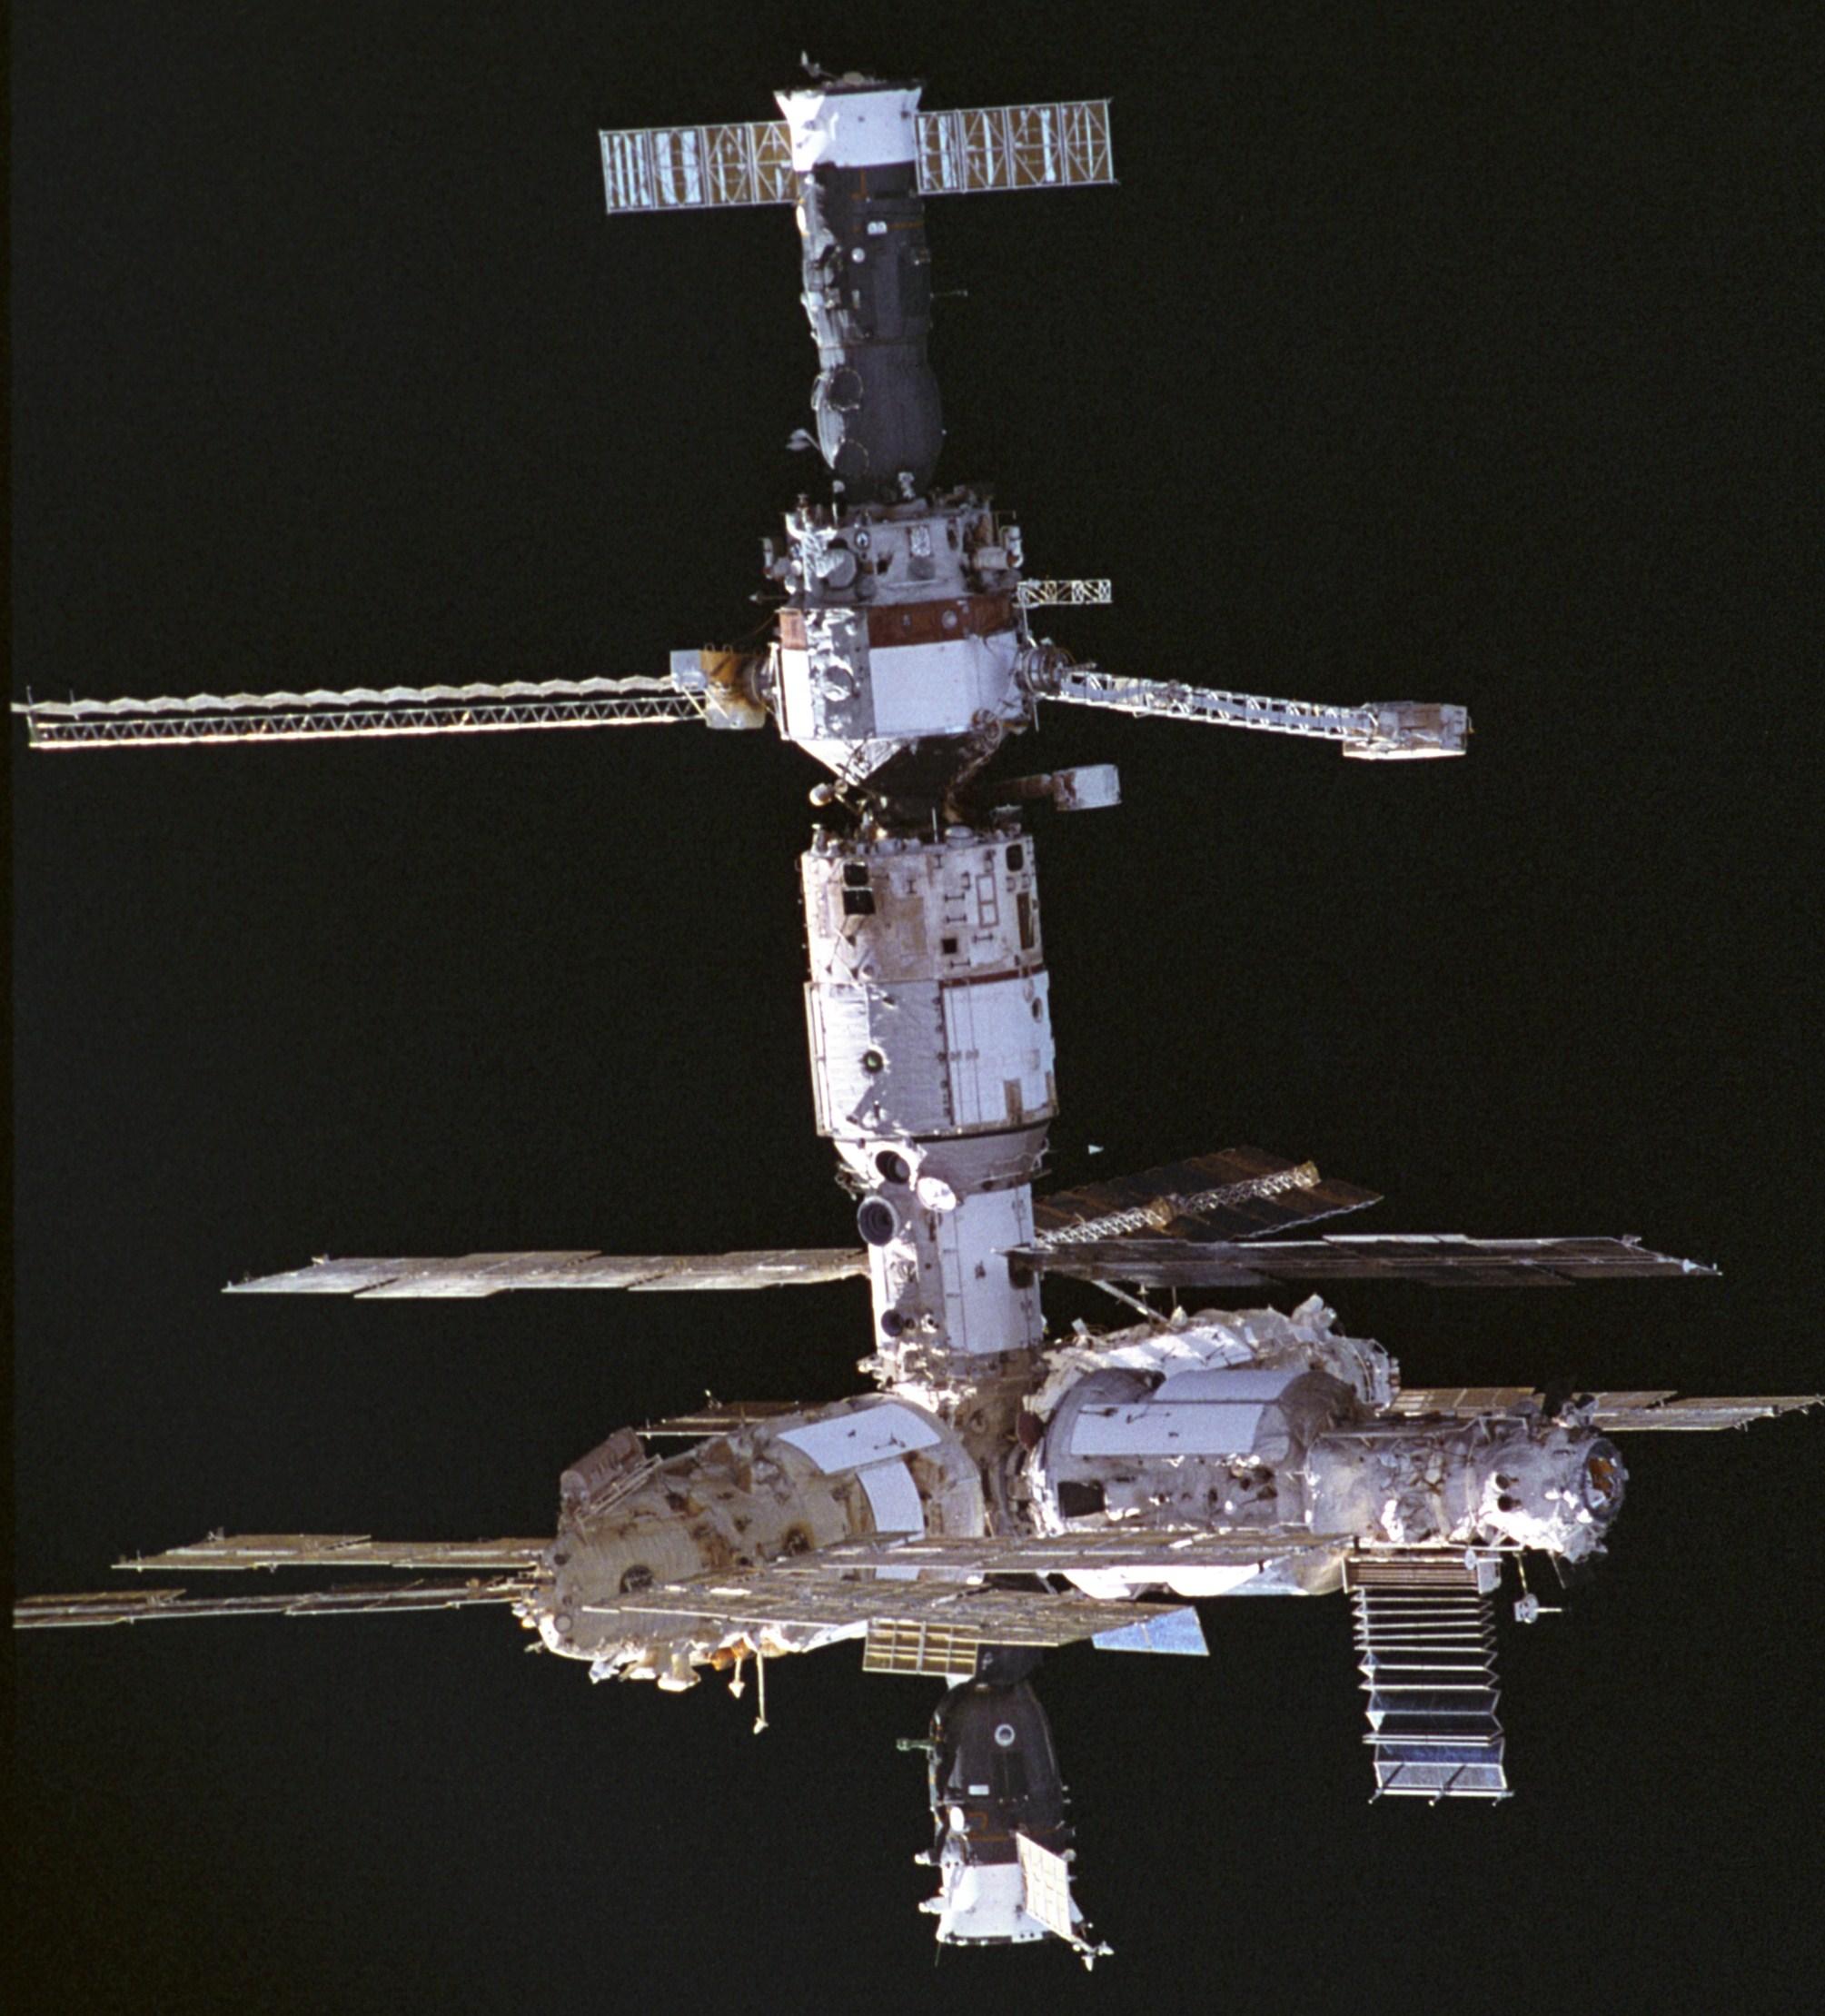 ksp space station mir - photo #17